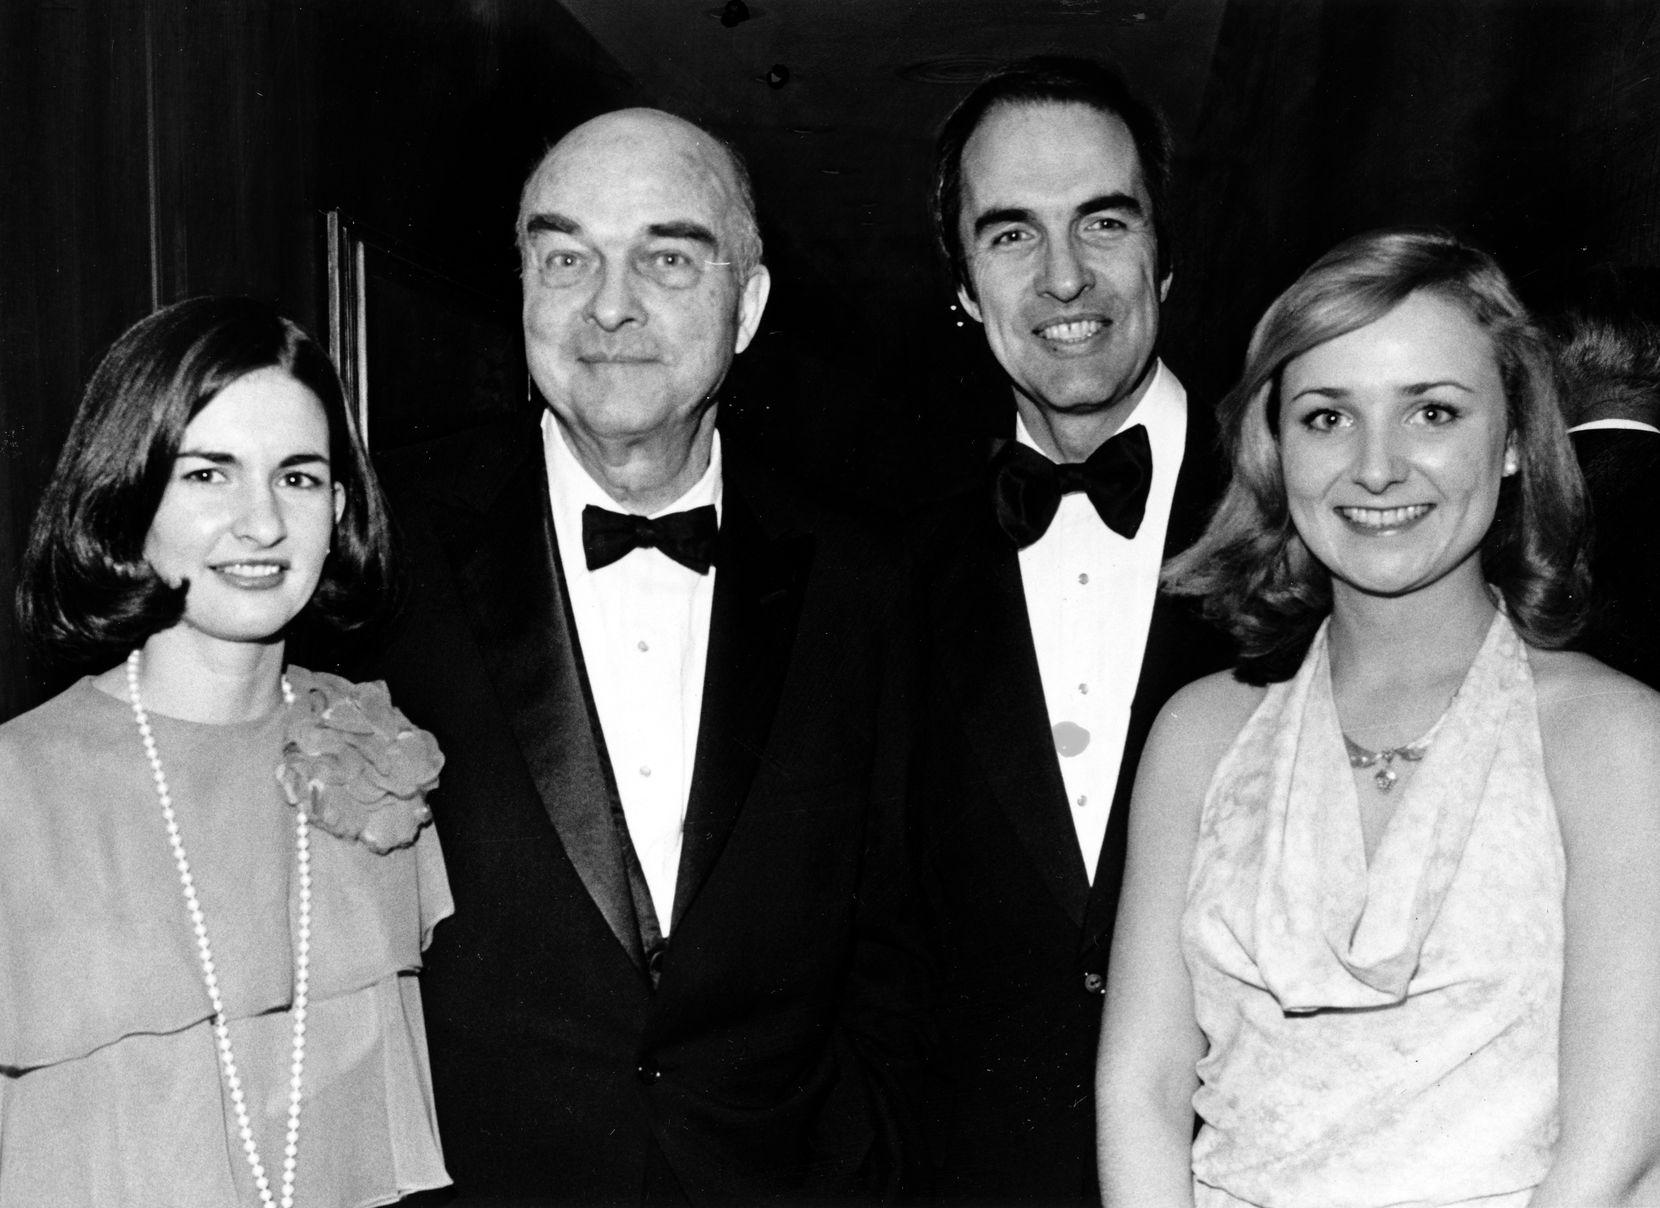 In Dallas in 1974, from left: Chris Jonsson, J. Erik Jonsson, Philip Jonsson and Teresa Haggerty.